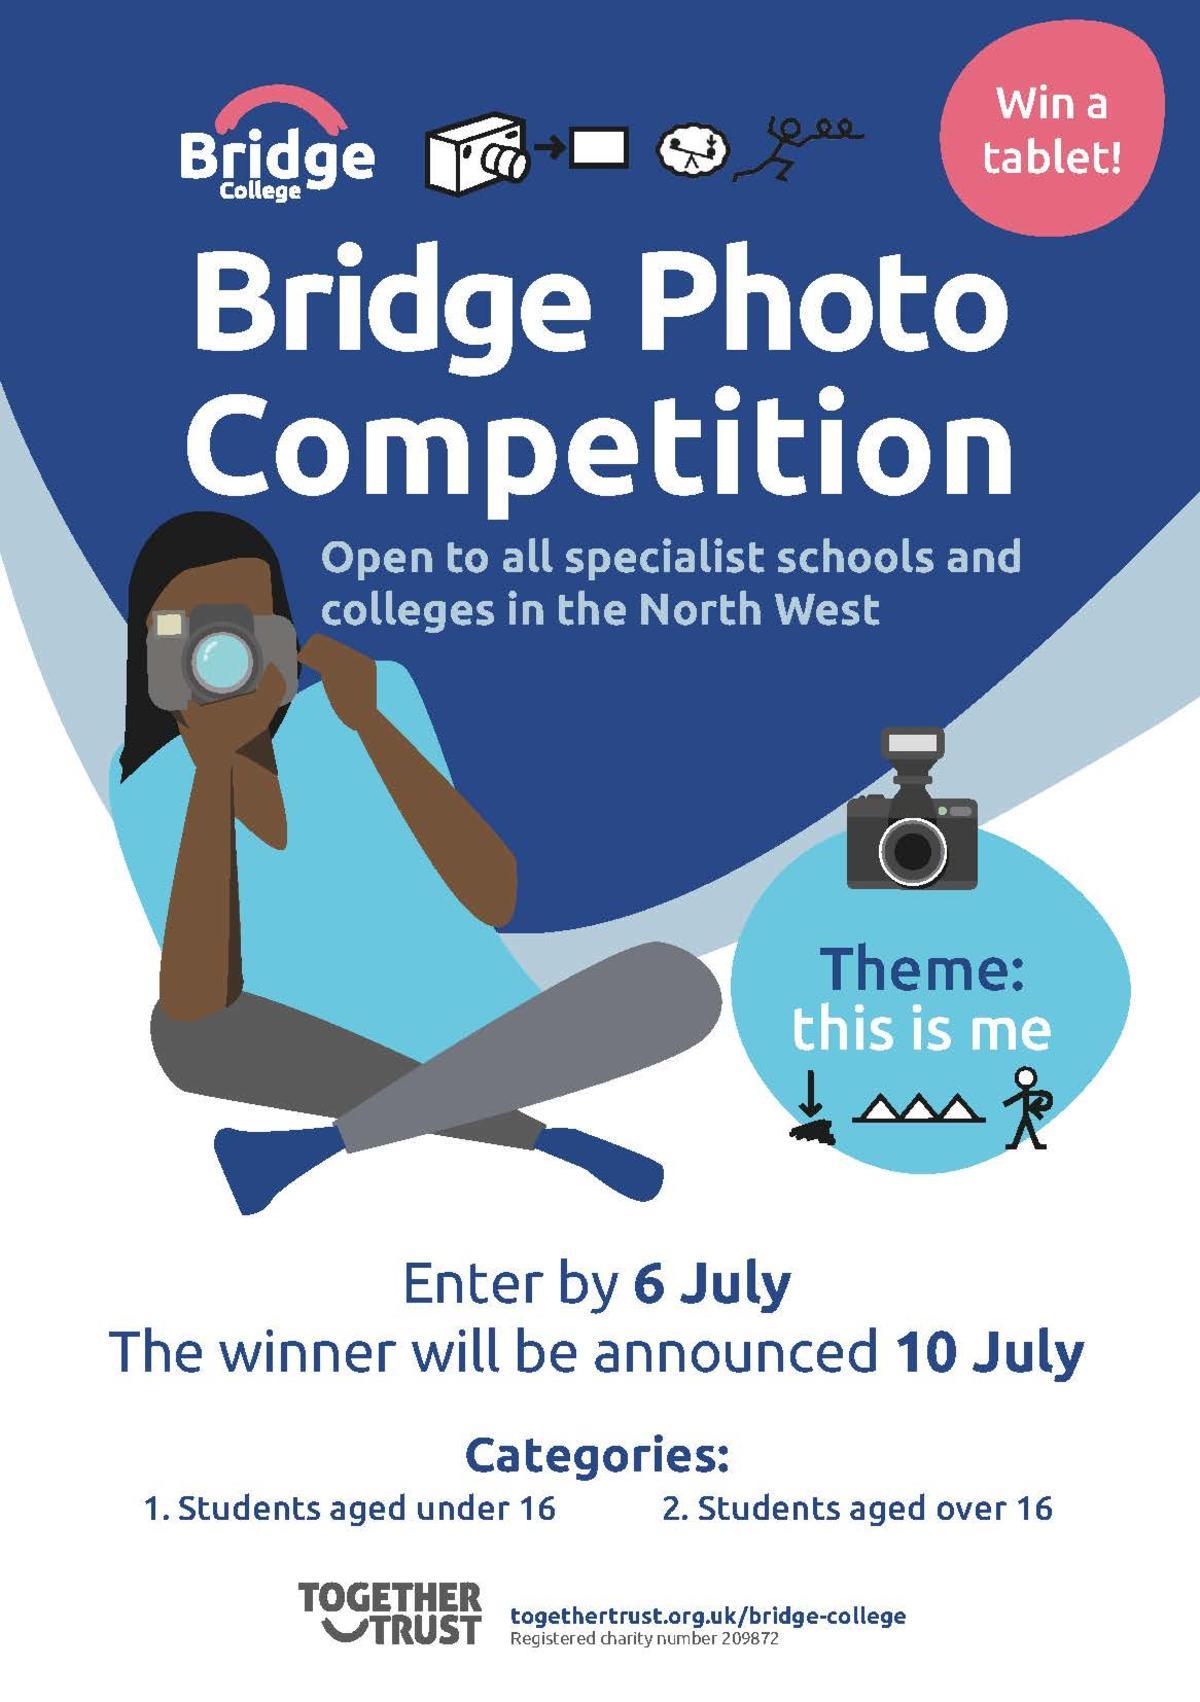 Bridge College specialist schools photo competition